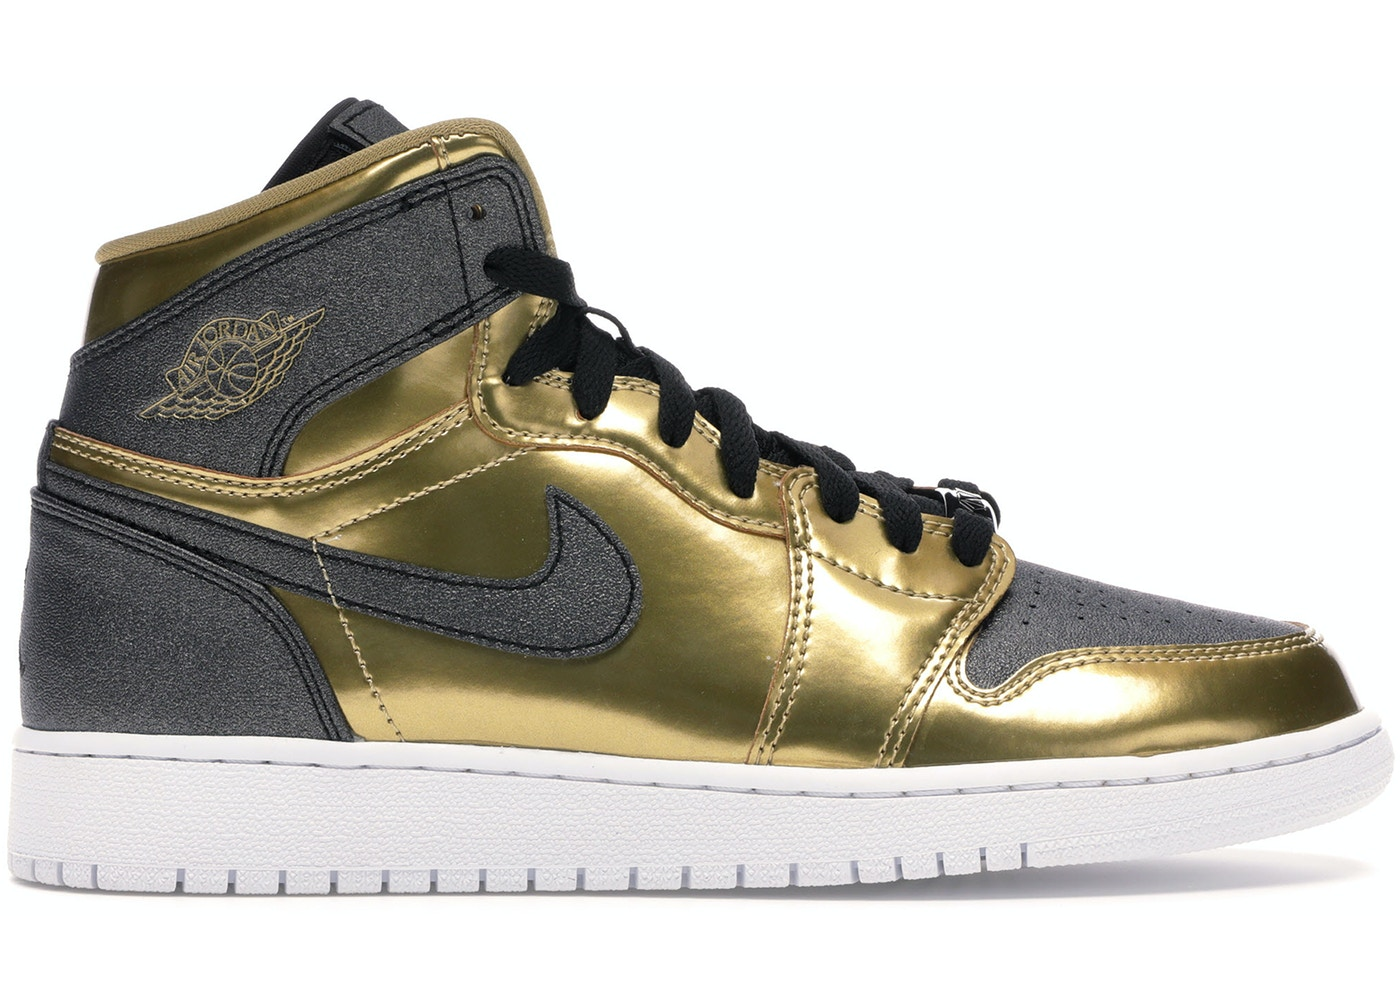 premium selection b0b8f e1421 Air Jordan 1 Shoes - Volatility